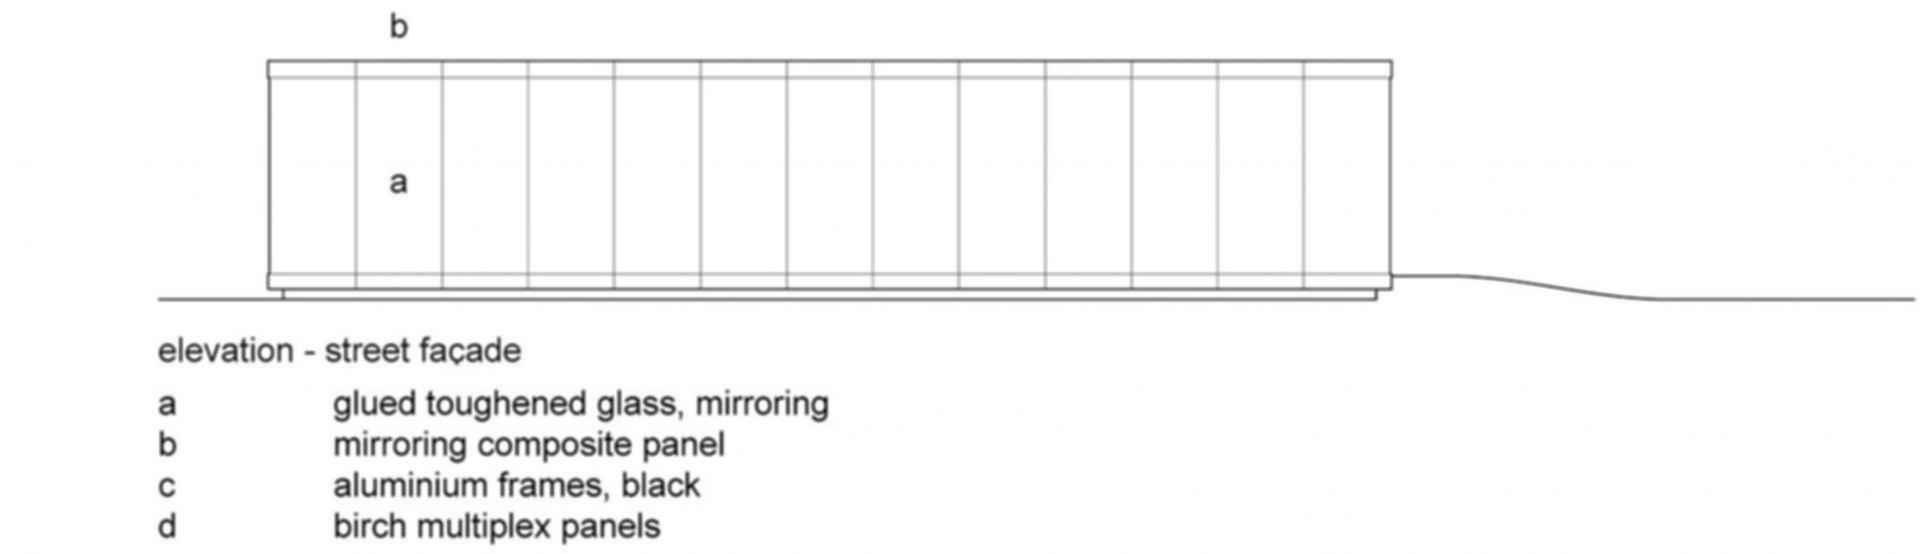 Mirror House, Almere - Concept Design/Elevation